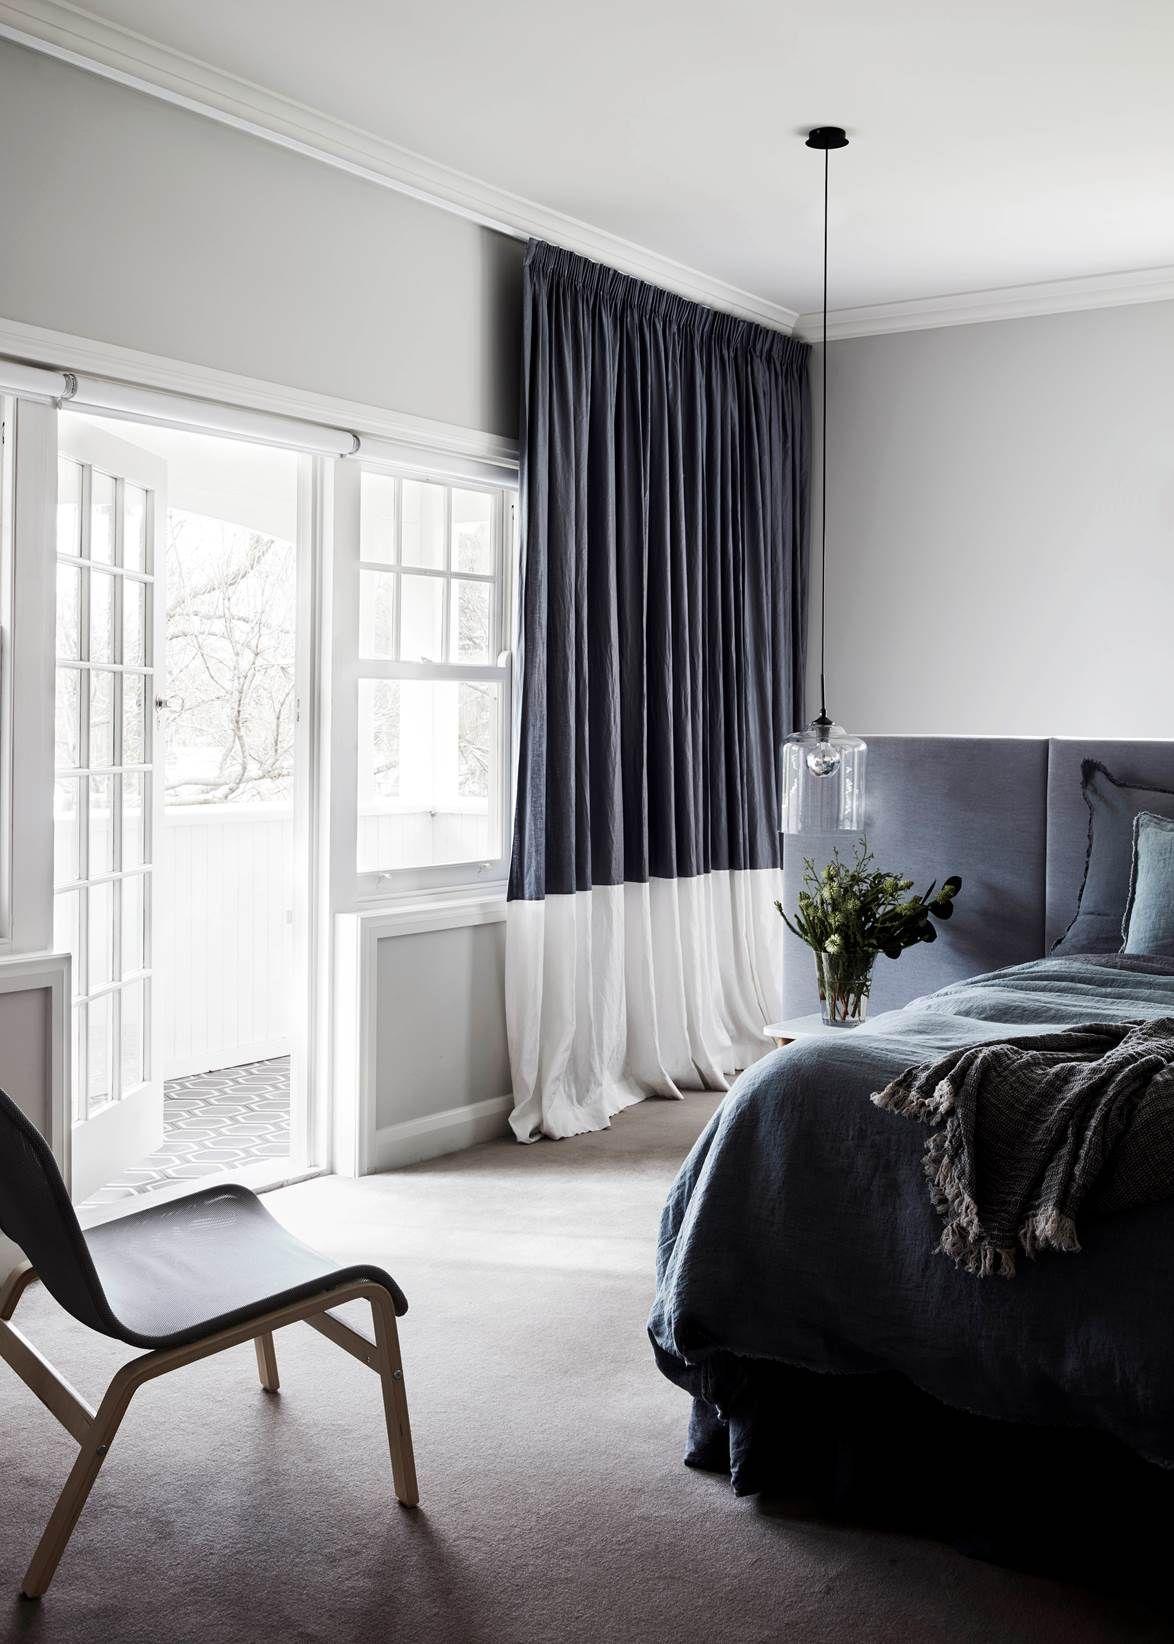 10 Brilliant Bedroom Design Ideas Gray Bedroom Home Curtains Gray bedroom curtains ideas